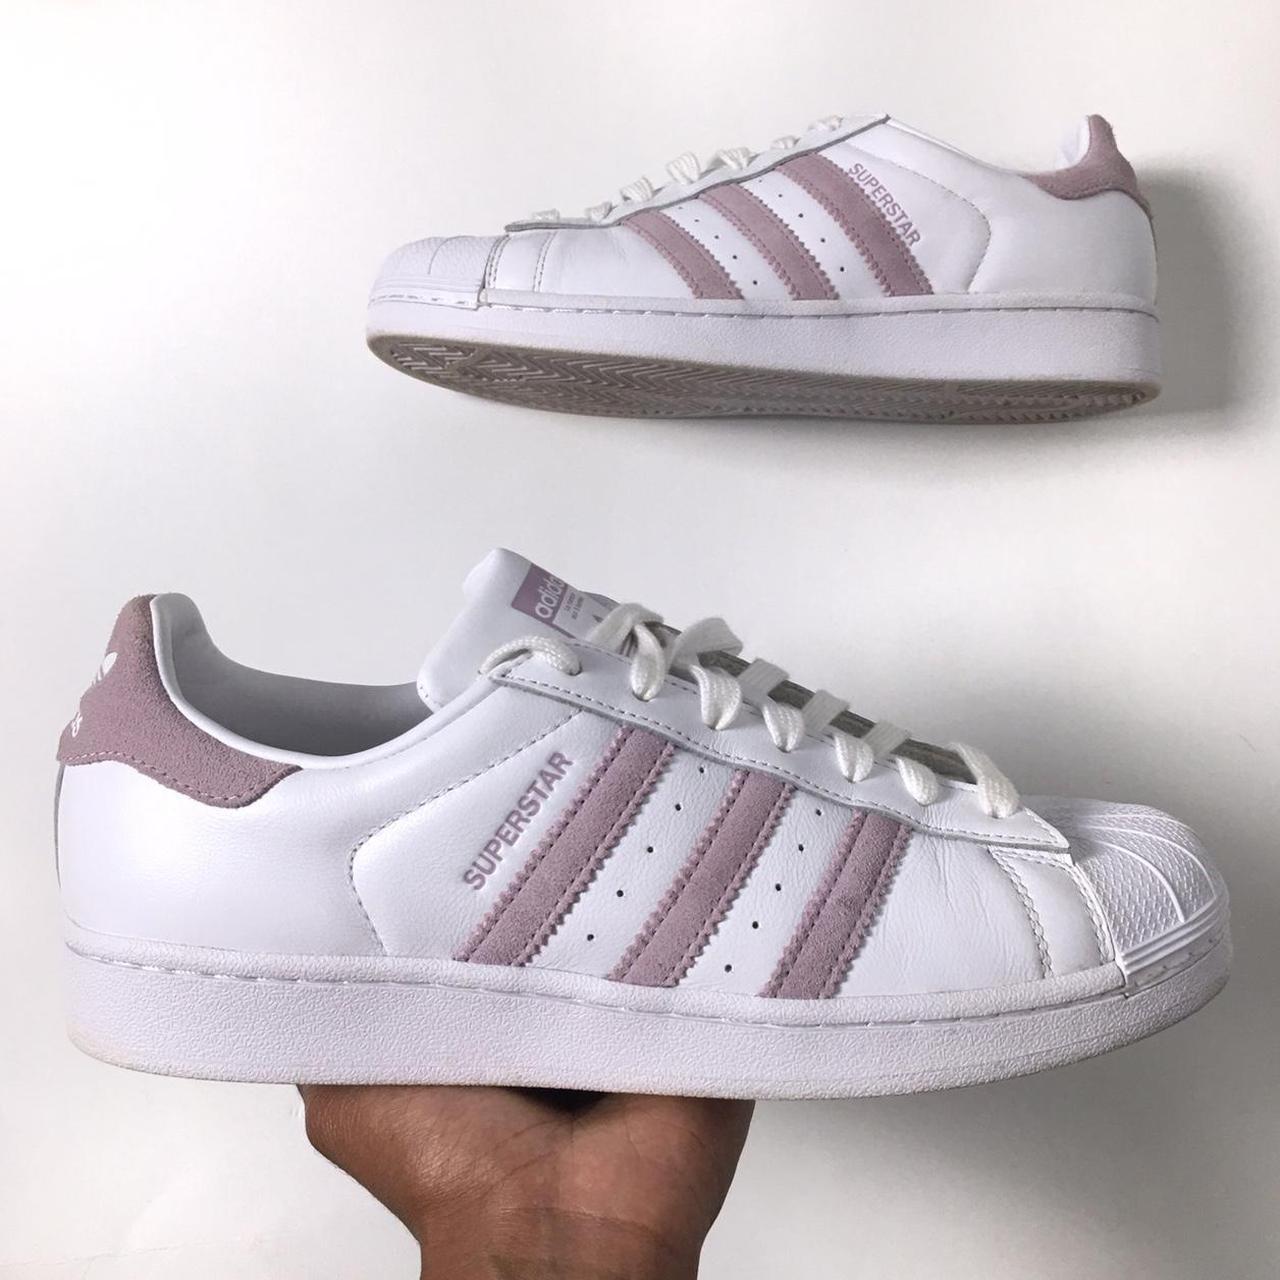 Product Image 1 - adidas Originals Superstar Sneakers in